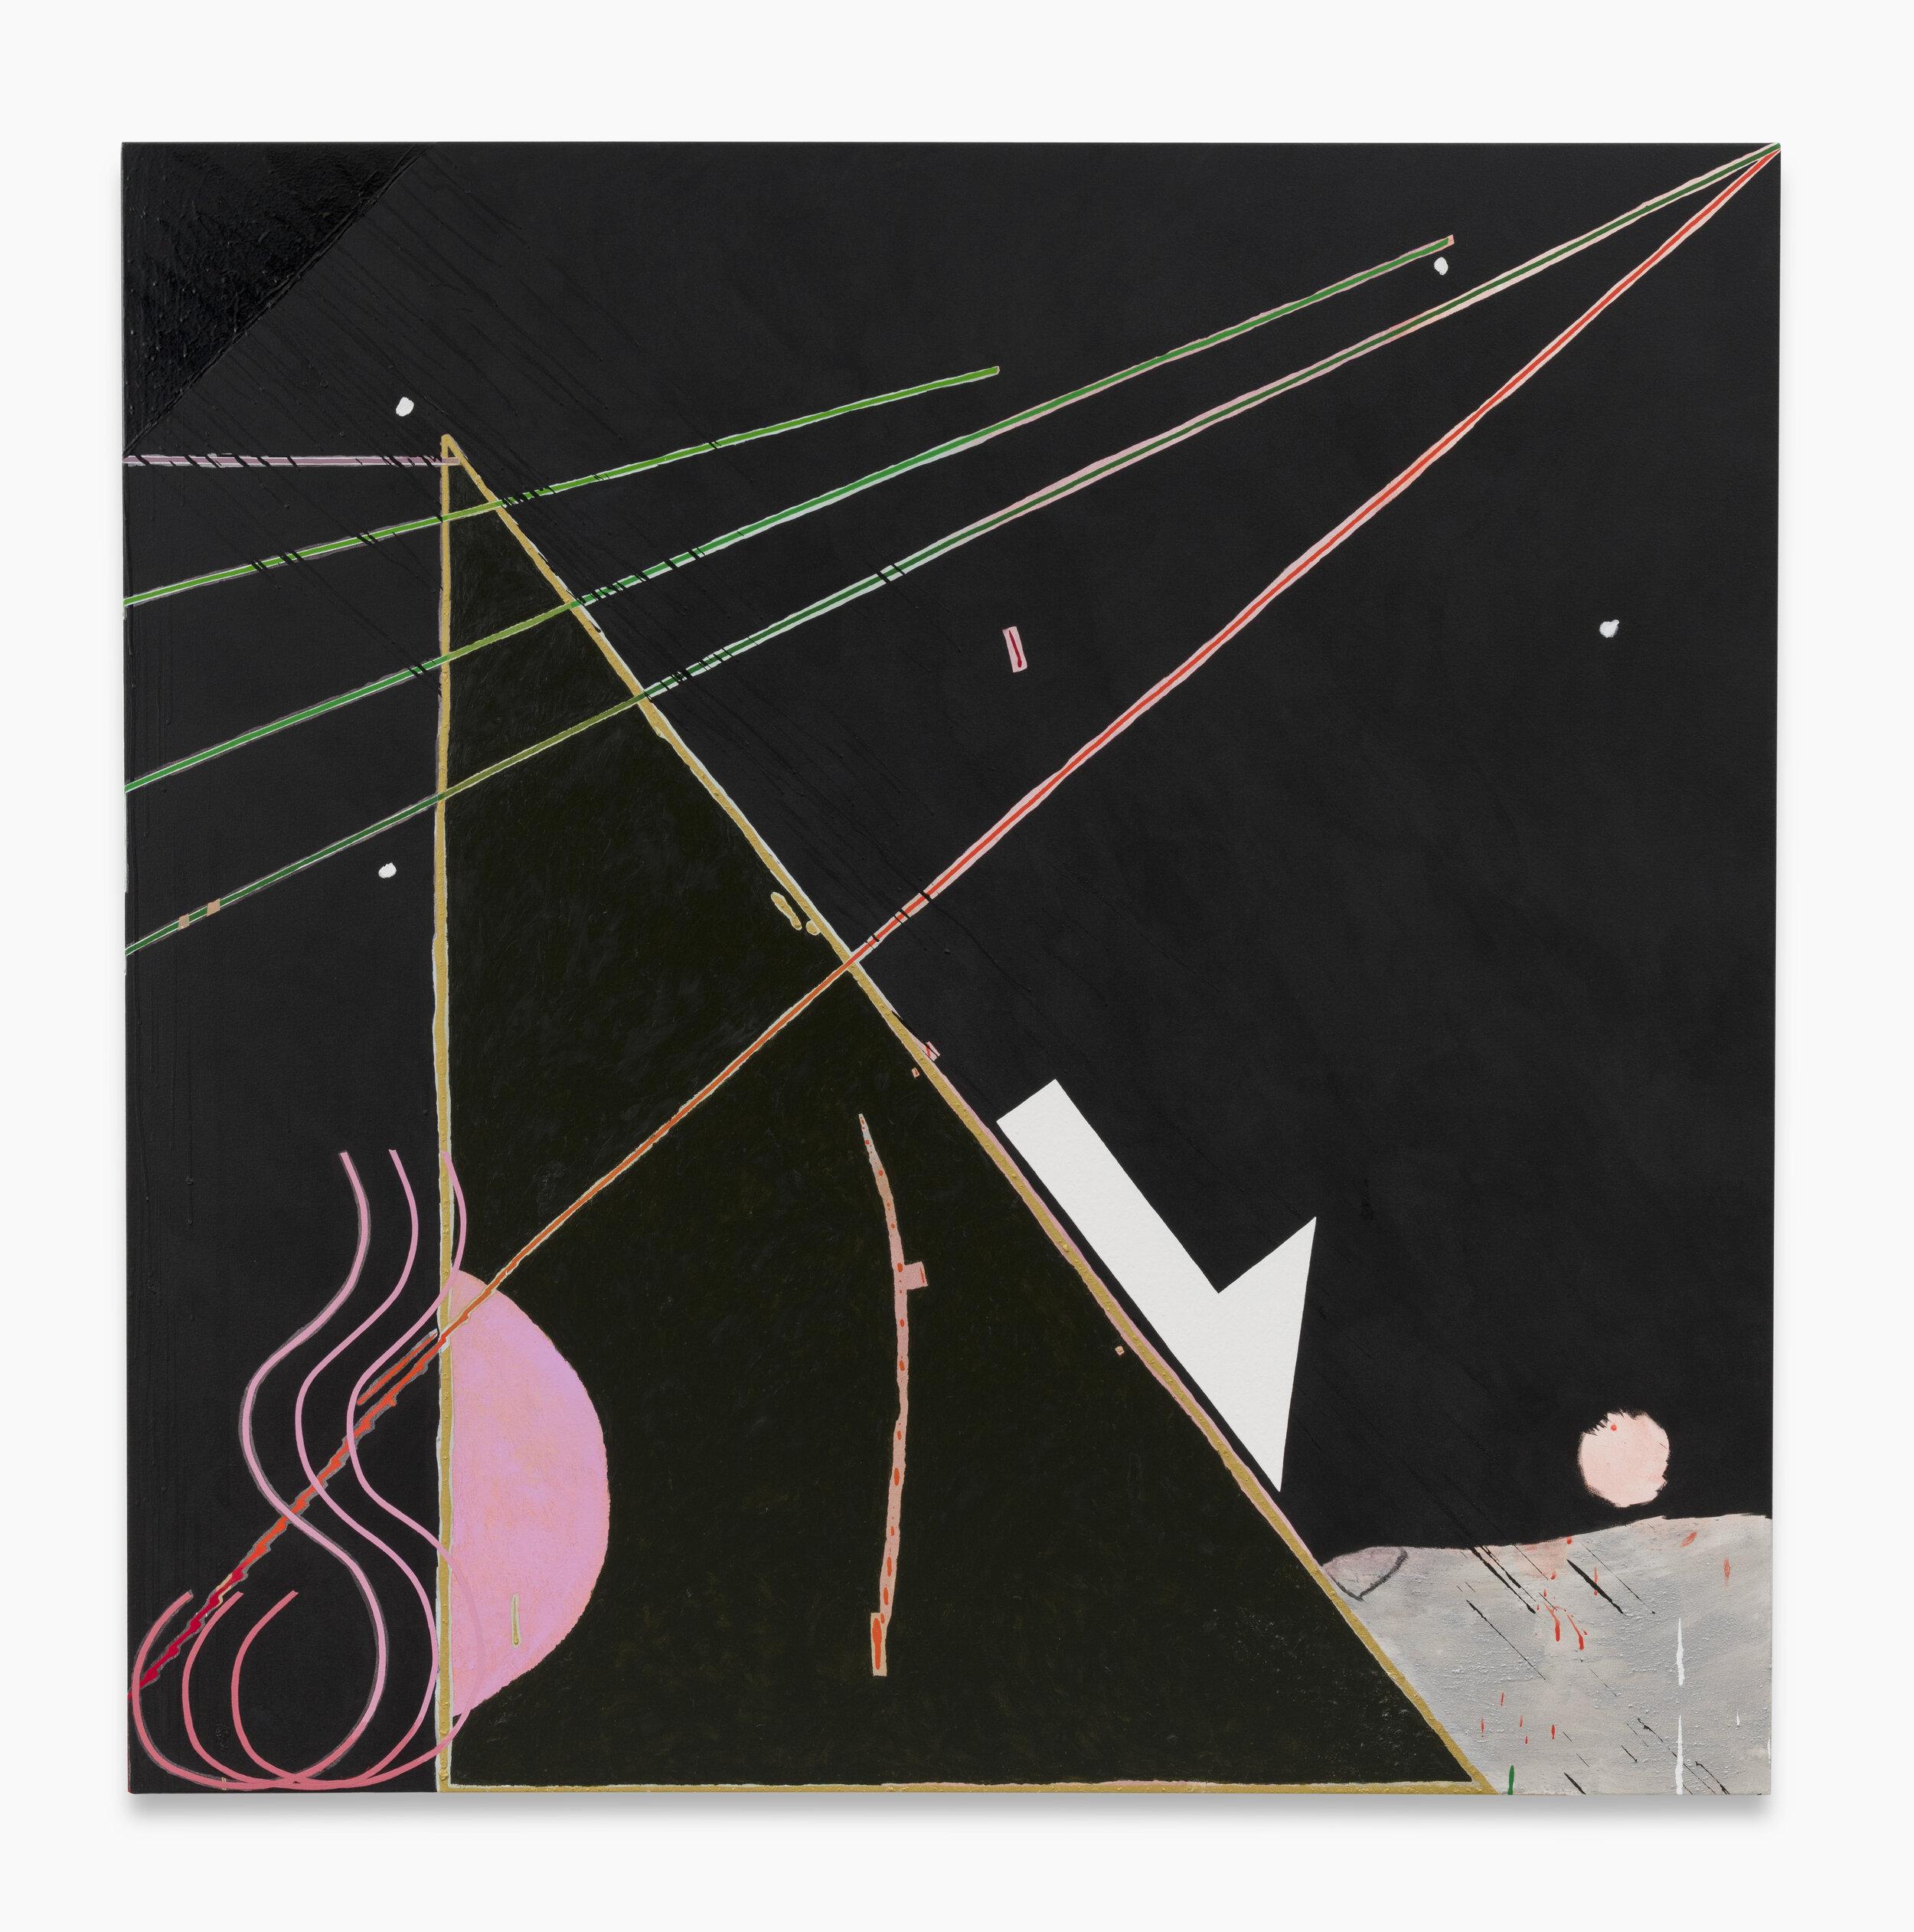 Allison Miller ,   Sister (Gemini),  2019. Oil, oil stick, acrylic, marble dust, 66 x 66 inches, 167.6 x 167.6 cm